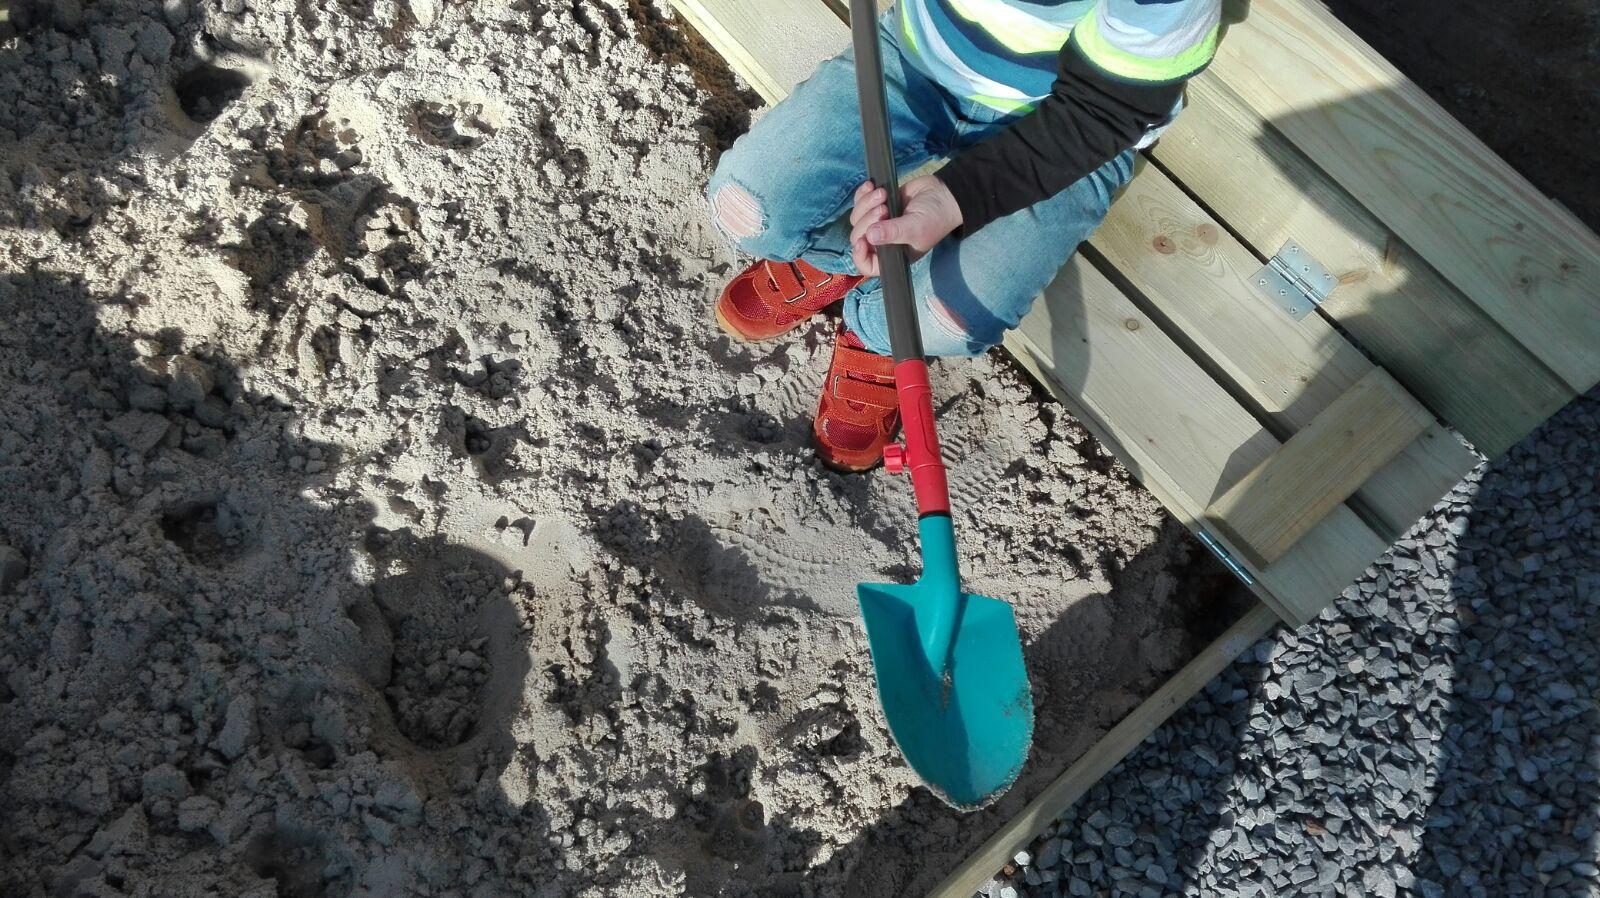 5-16-naturino-schoenen-kleuter-sneakers-oranje-klittenband-goed--mooi-nanny-moeder-amsterdam-blog-review-zandbak